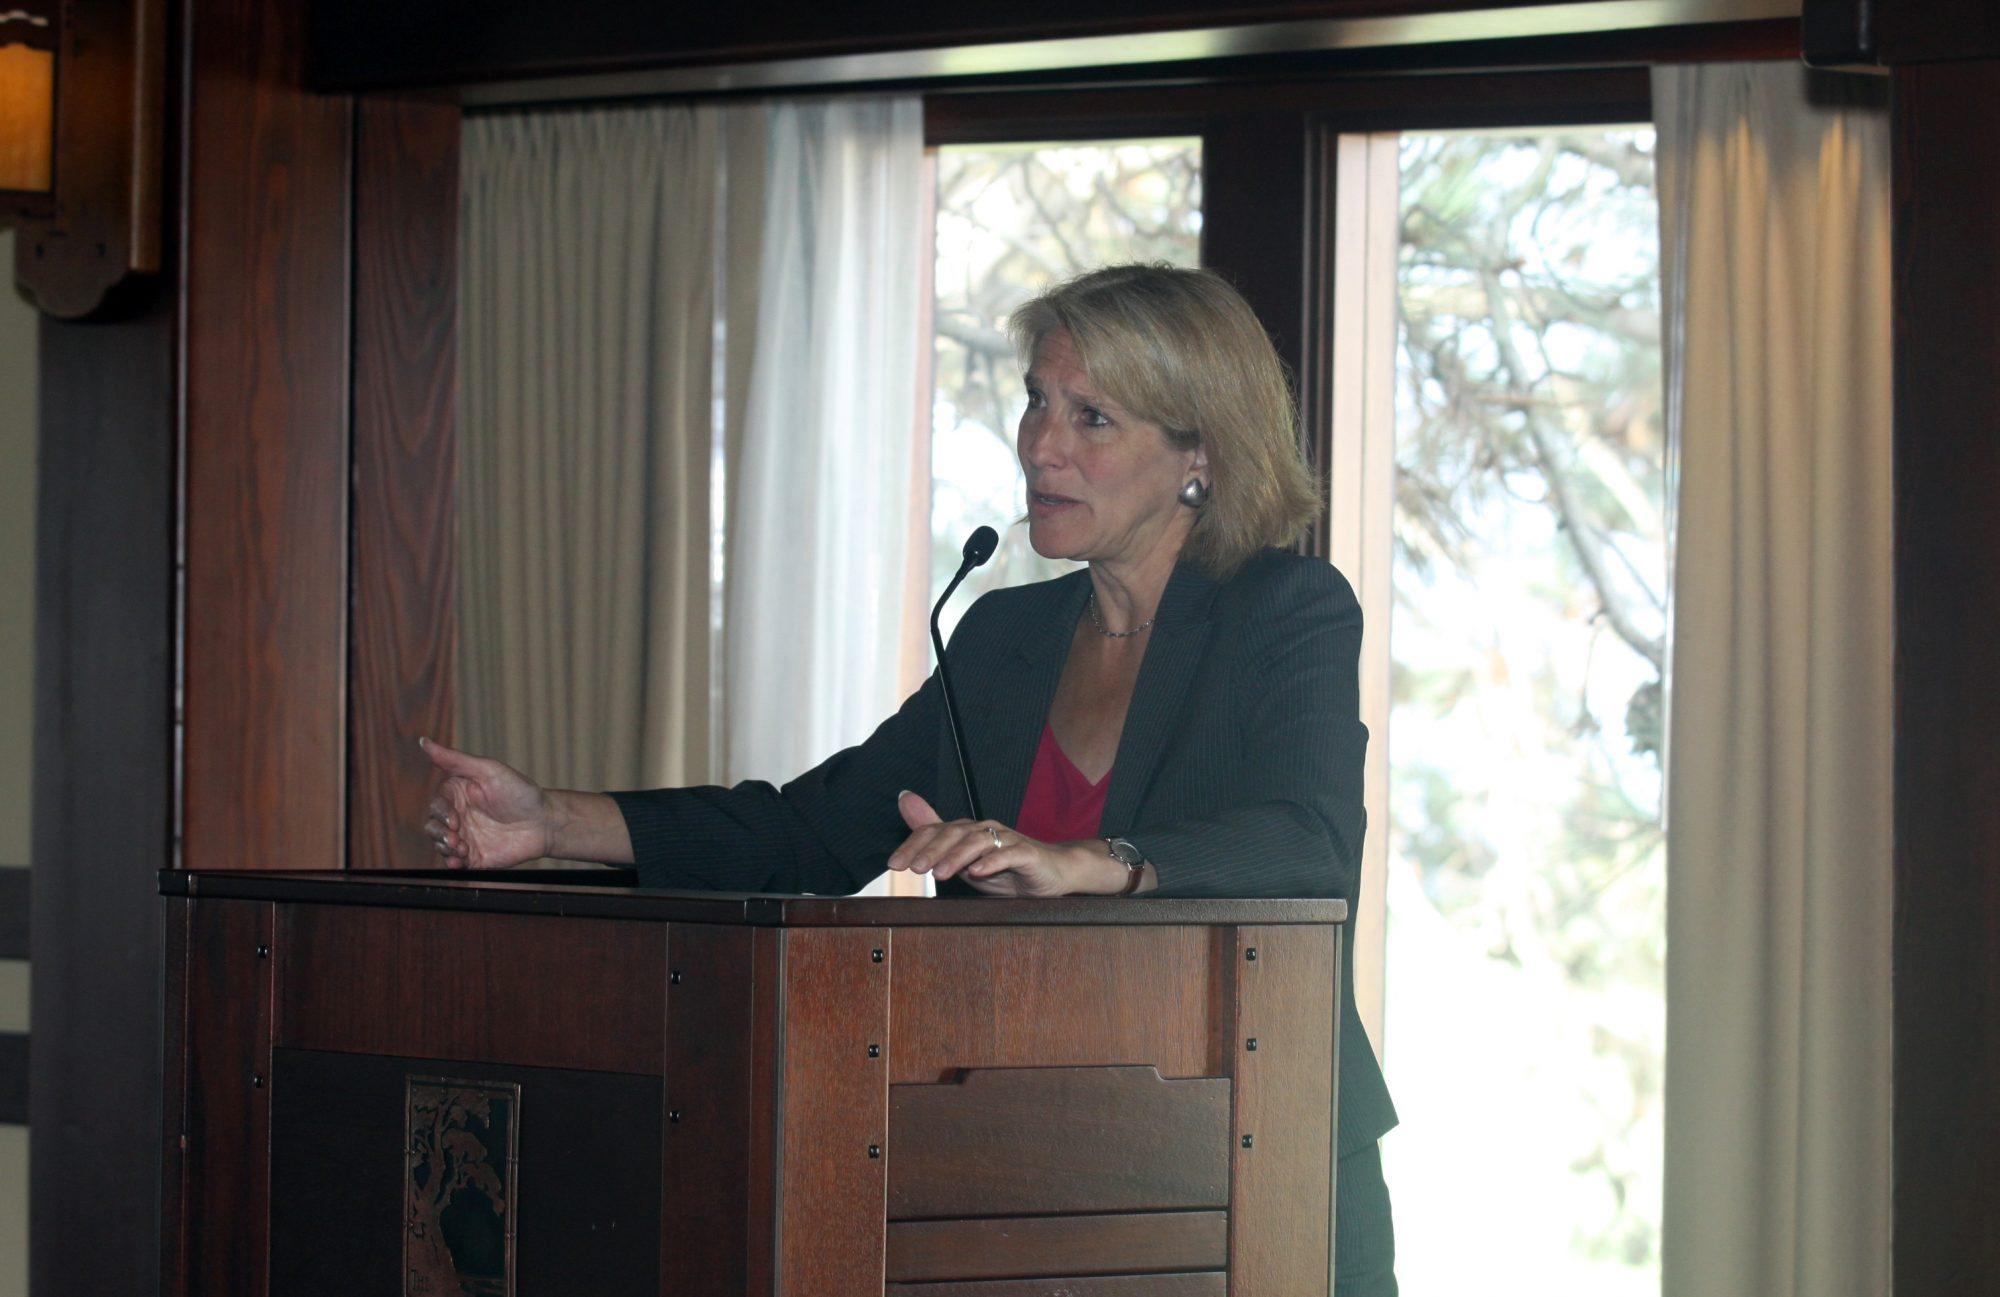 Dr. Karen Donfried